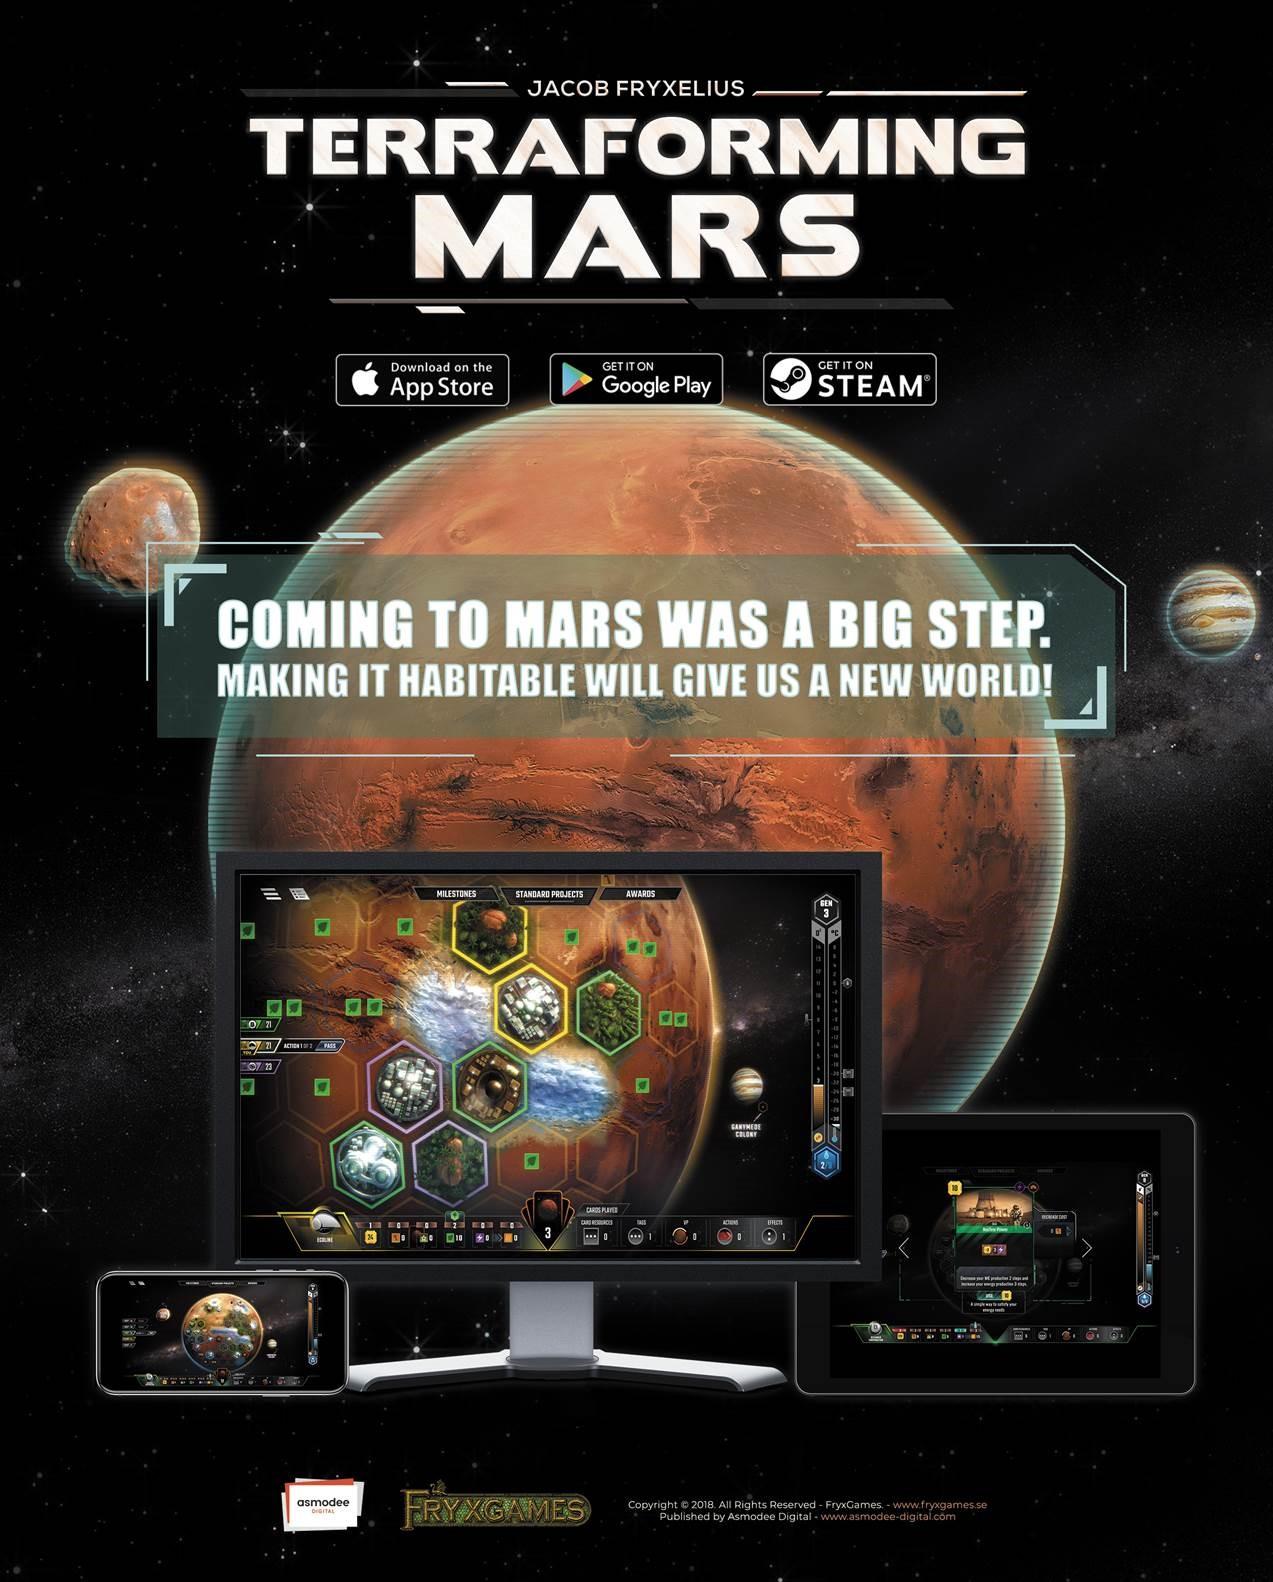 Terraforming Mars Pc Game: Terraforming Mars Digital